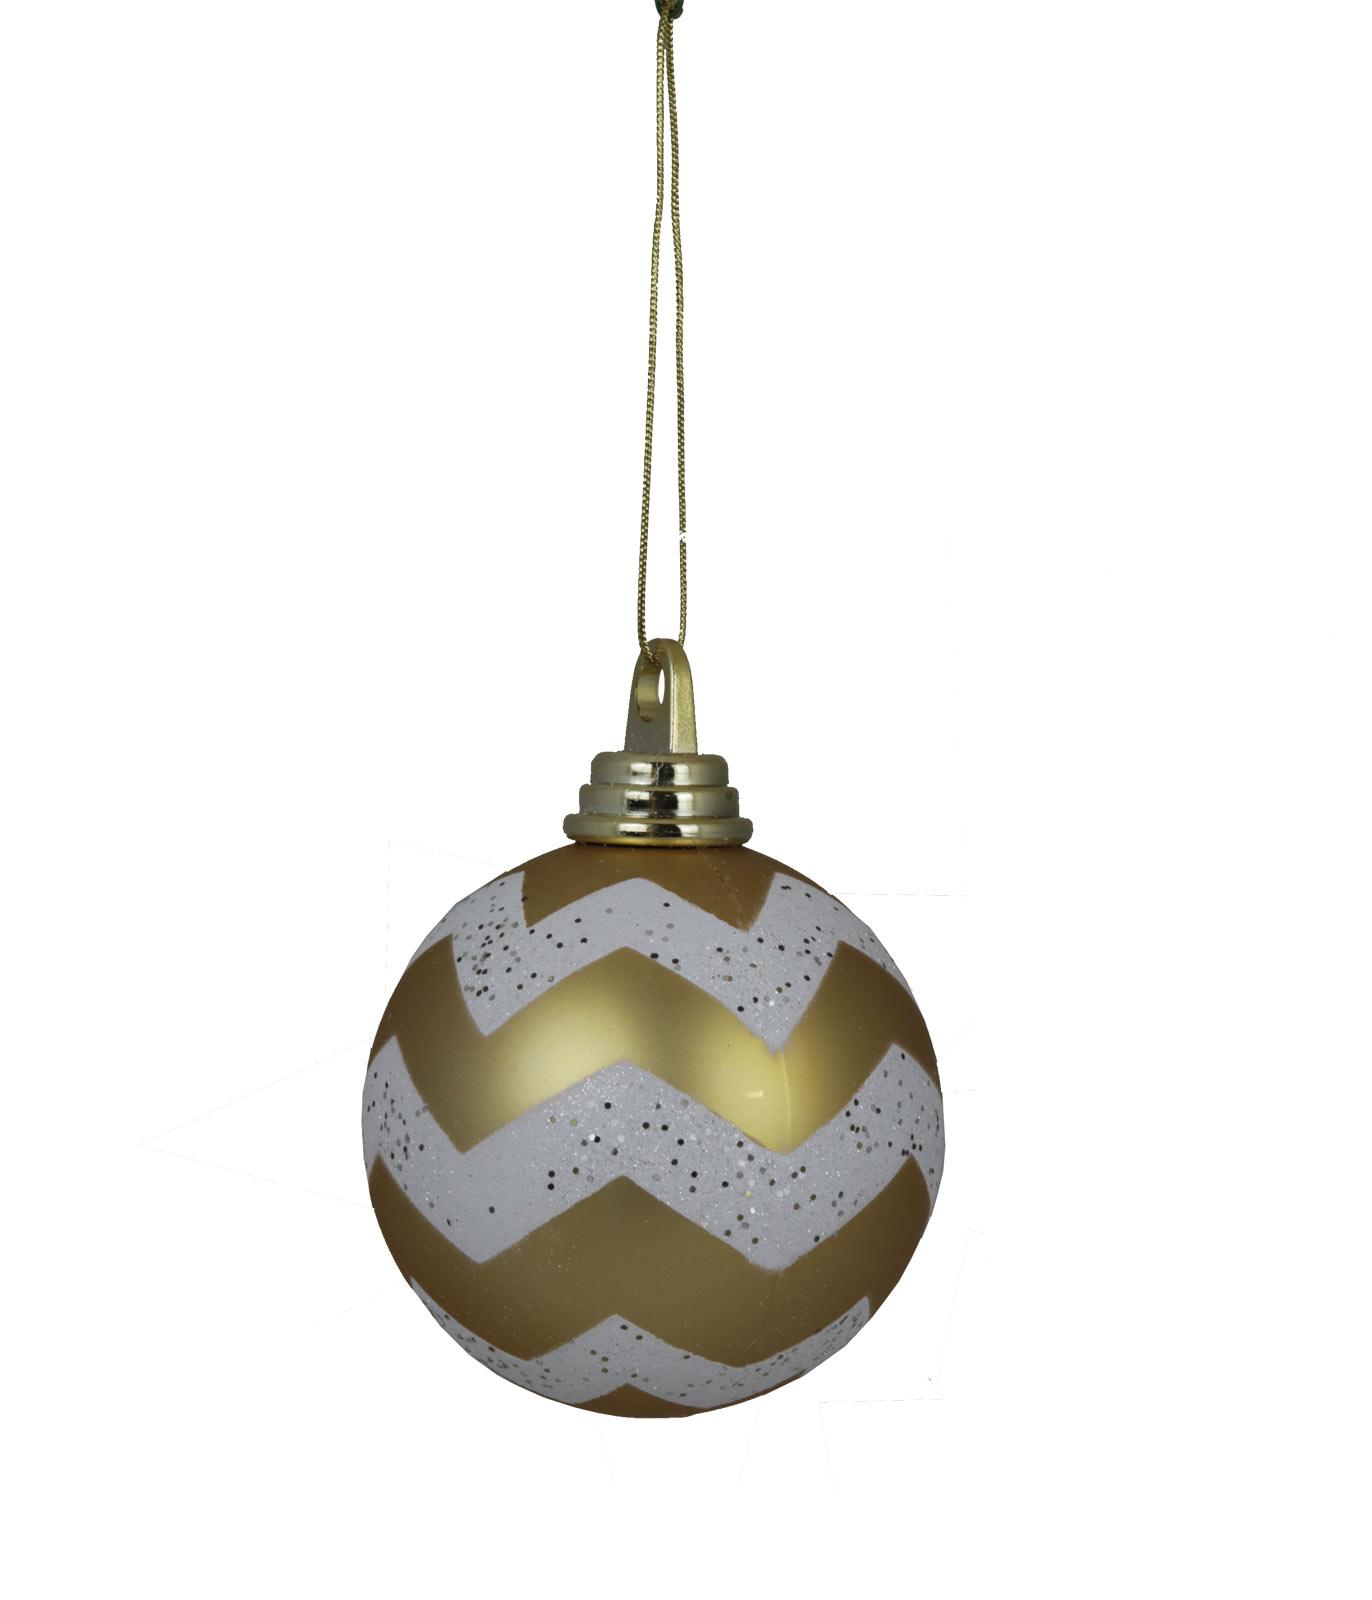 4 Quot Chevron Gold White Ornament Shatterproof Garden